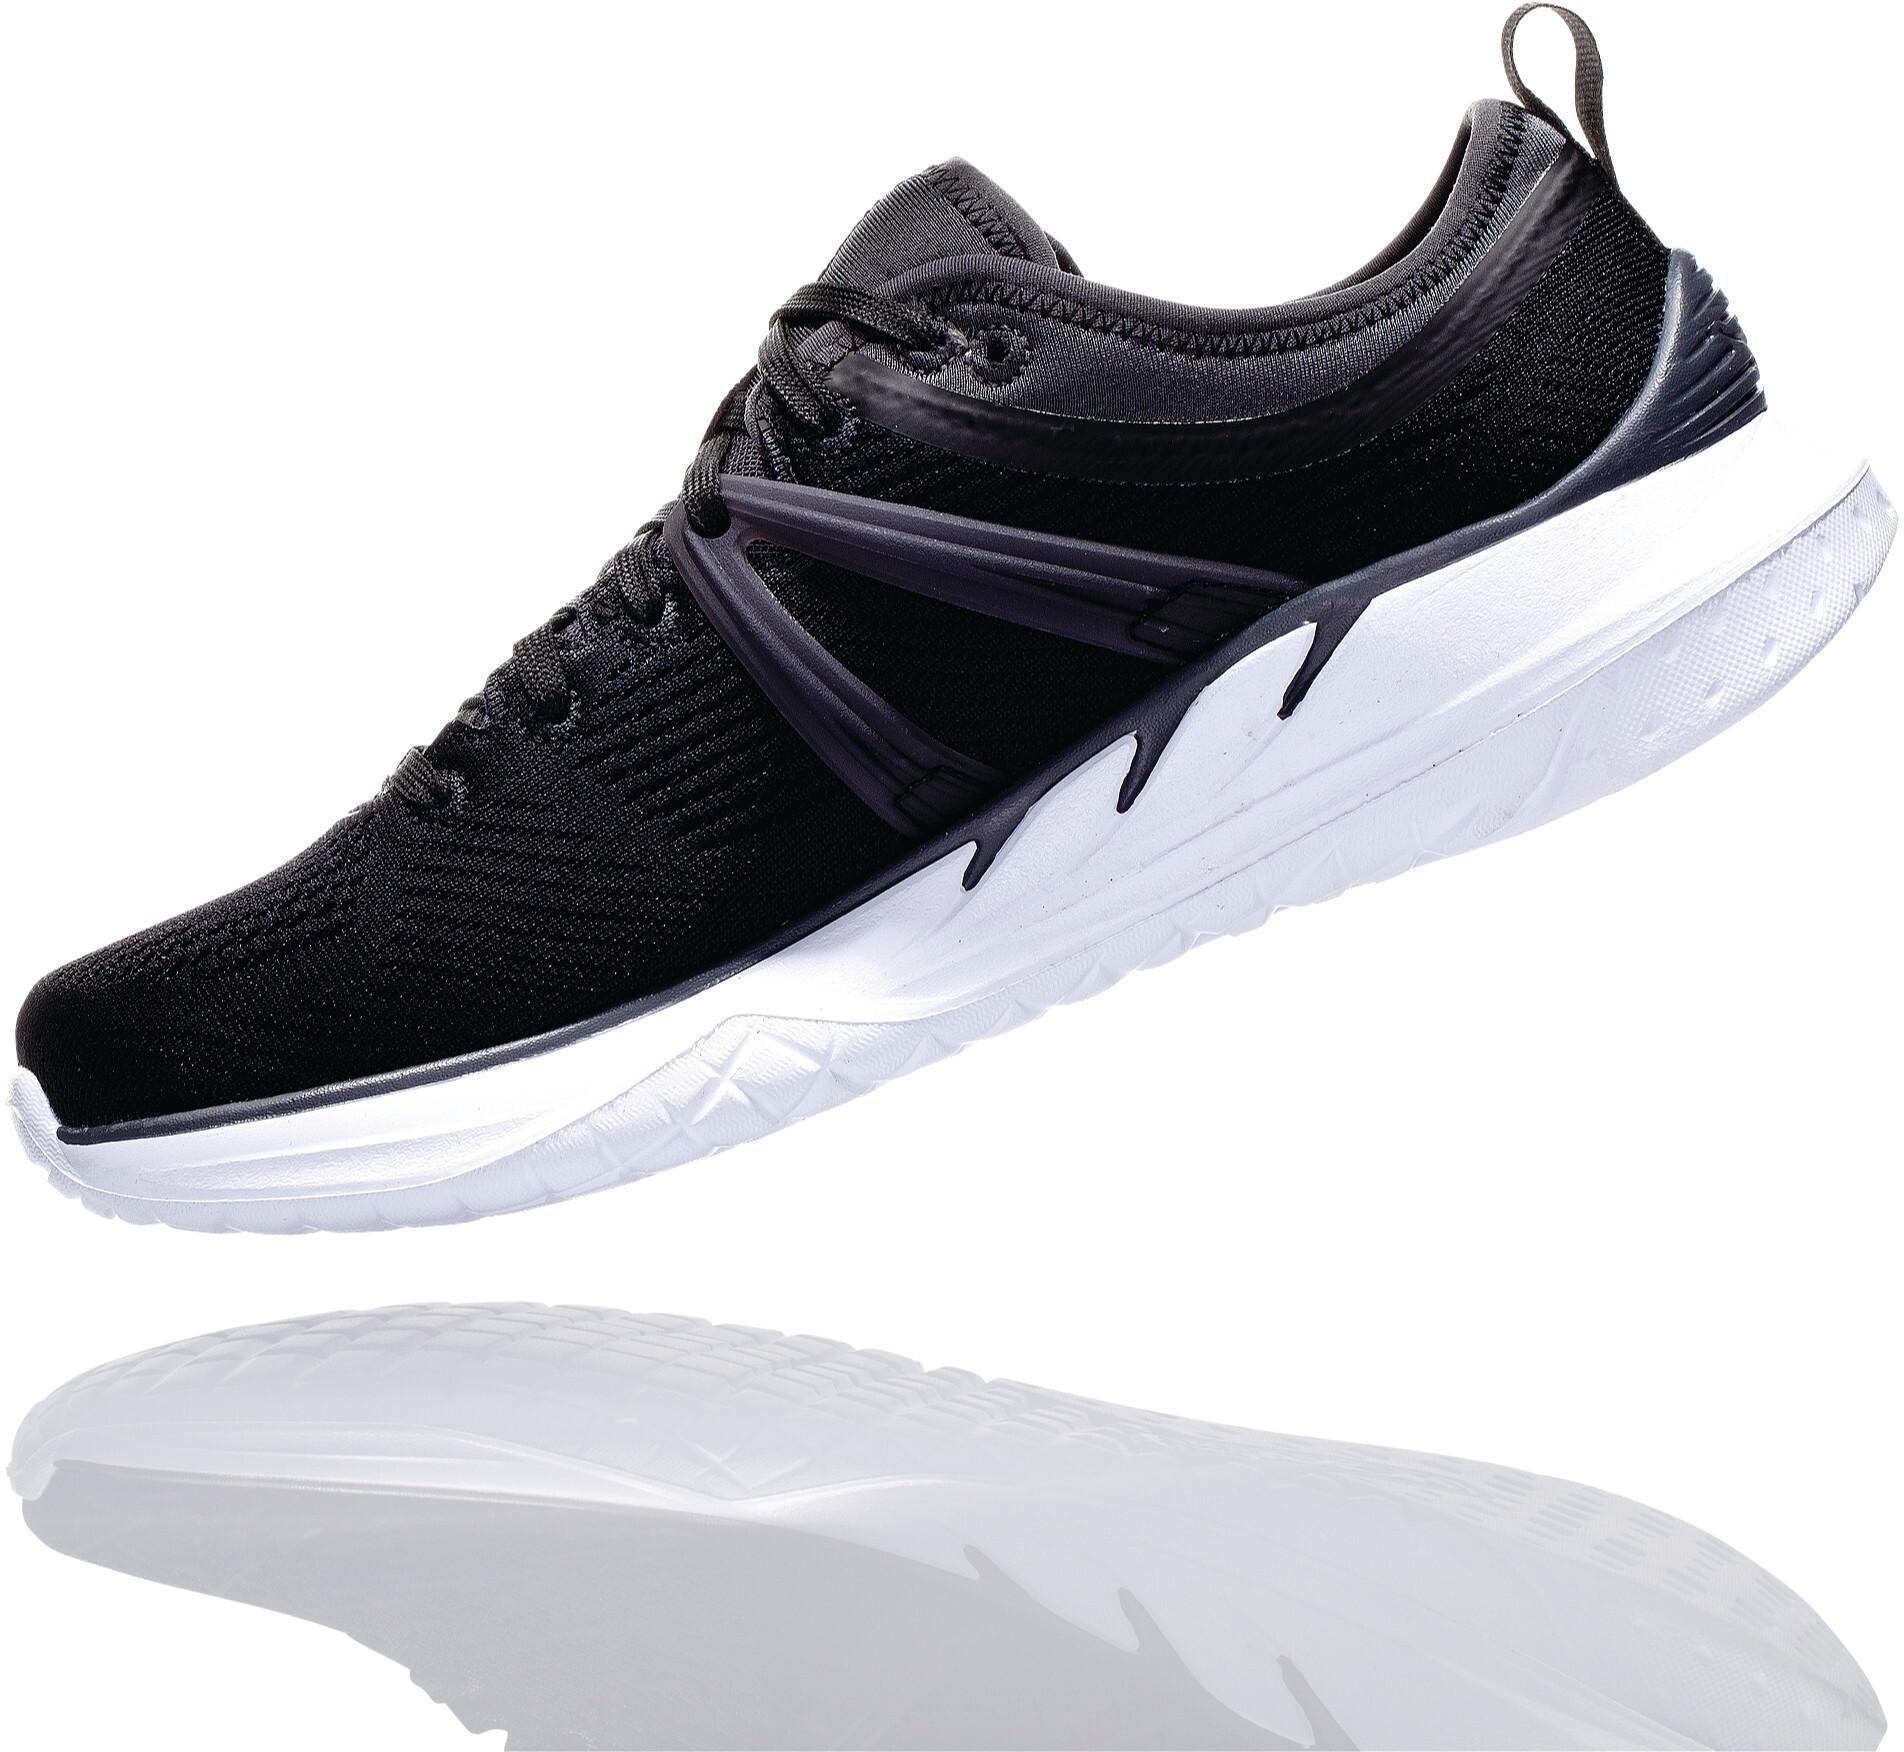 Hoka One One Tivra Shoes Women blackdark shadow